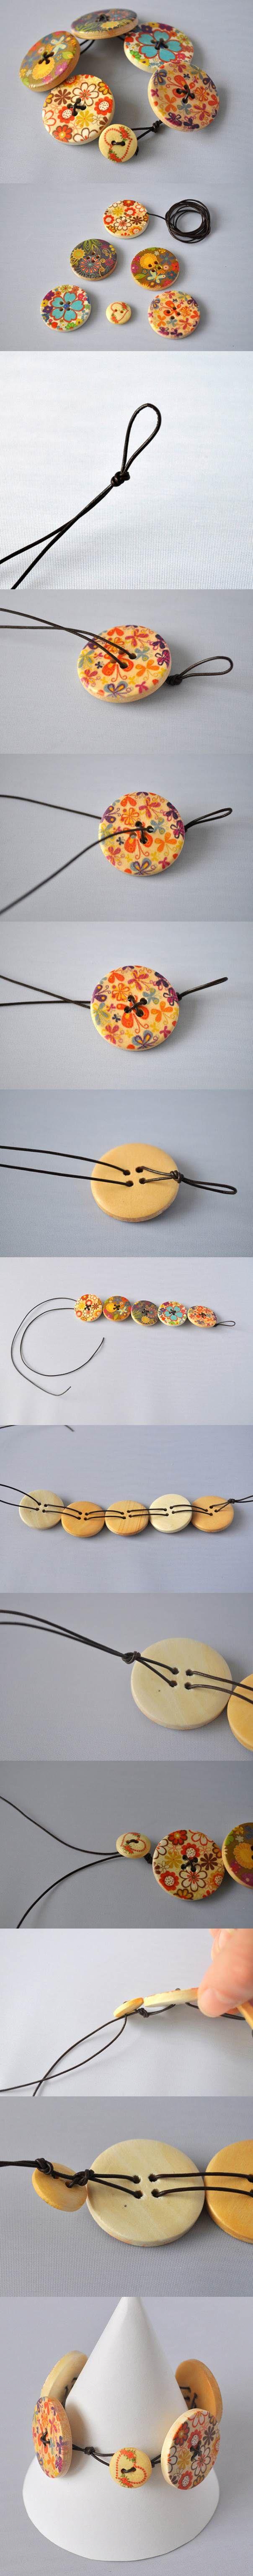 DIY Fashionable Button Bracelet | iCreativeIdeas.com Like Us on Facebook ==> https://www.facebook.com/icreativeideas